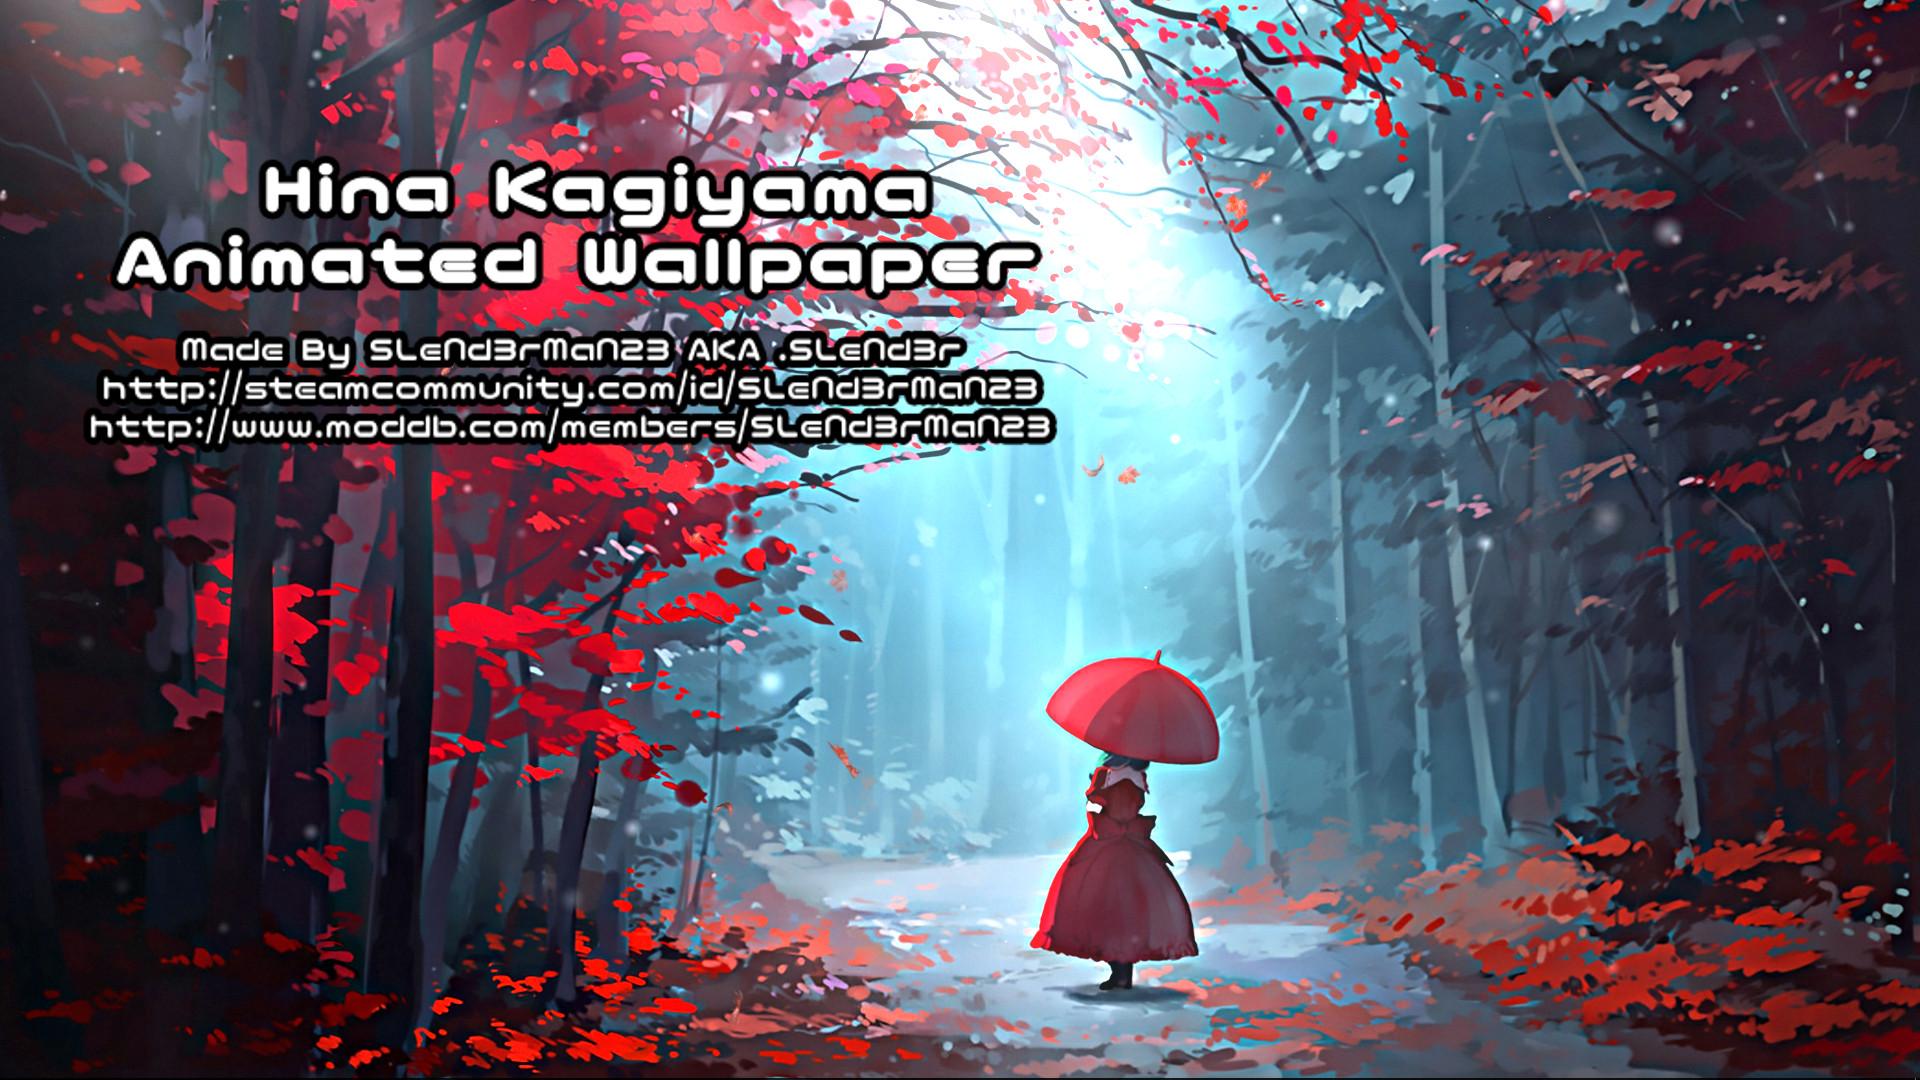 Steam Workshop Hina Kagiyama Animated Touhou Wallpaper 1st